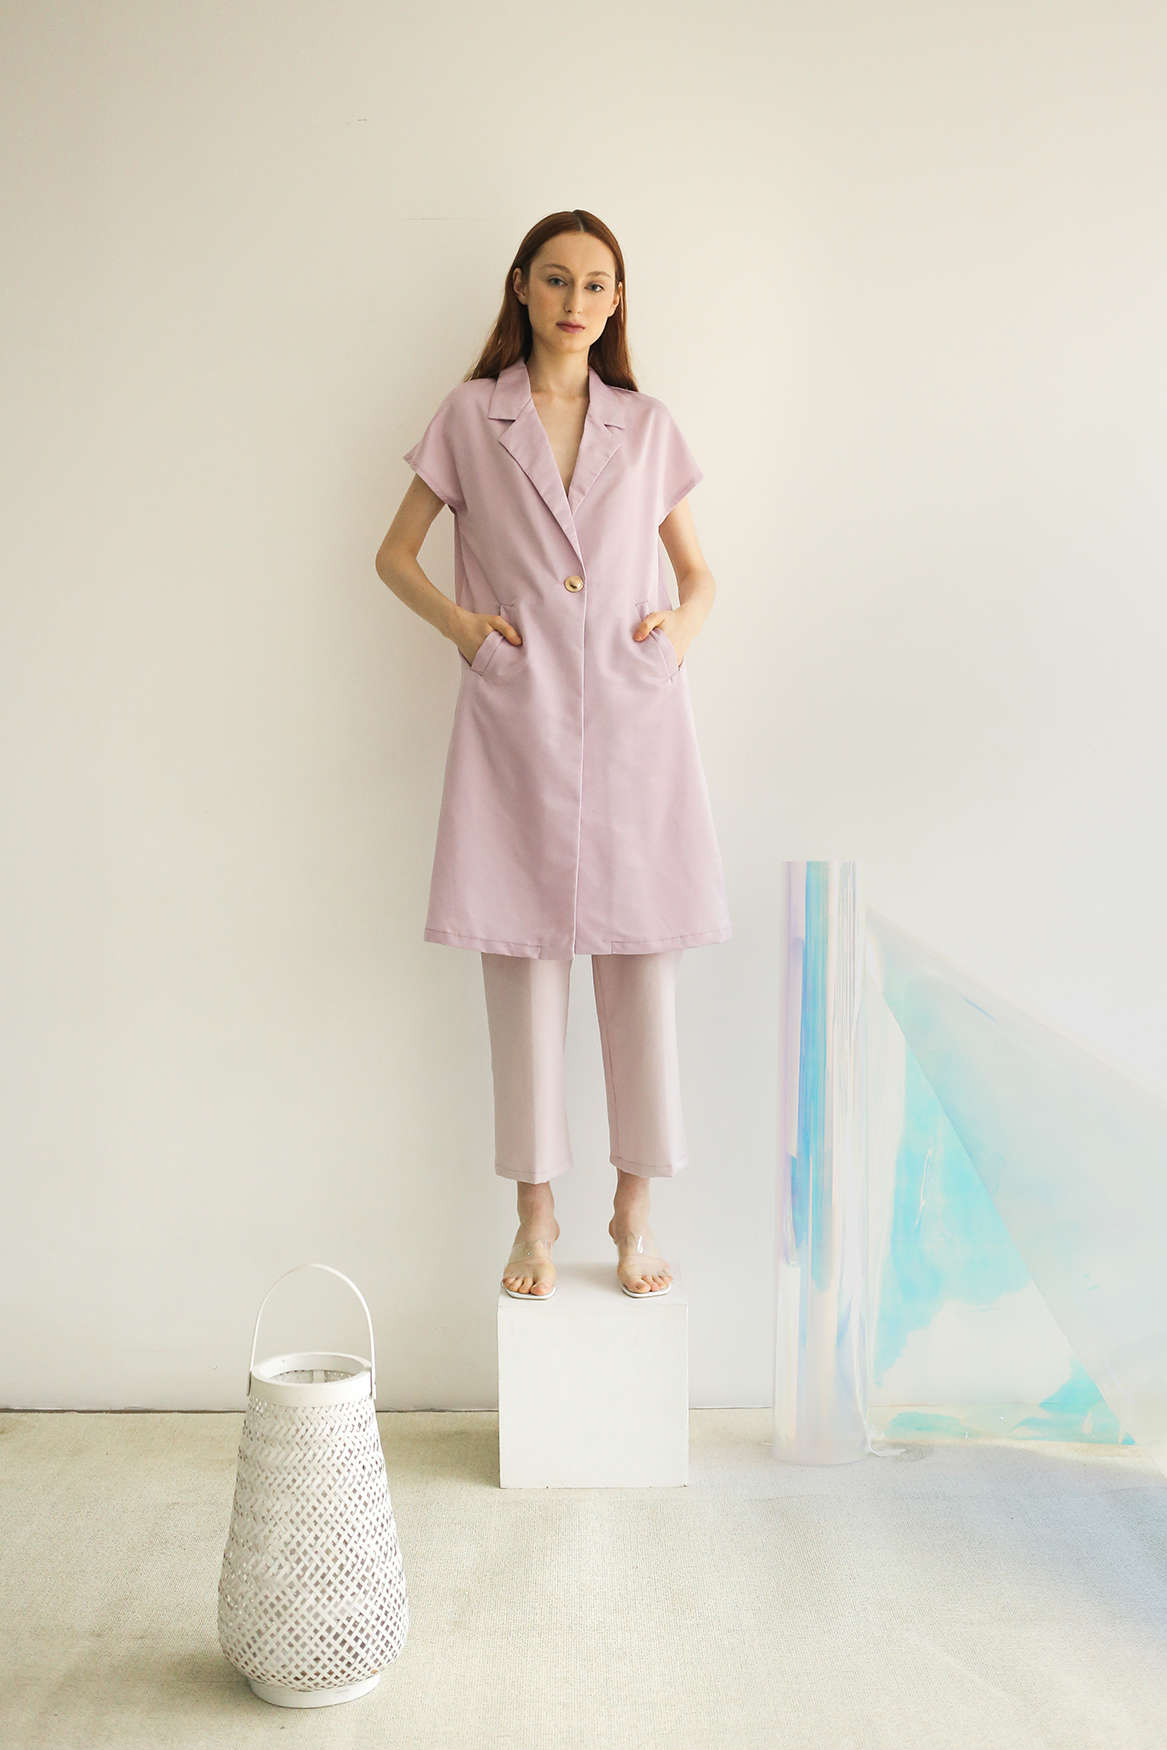 #PopbelaOOTD: Rekomendasi Outfit Serba Lilac dari Brand Lokal